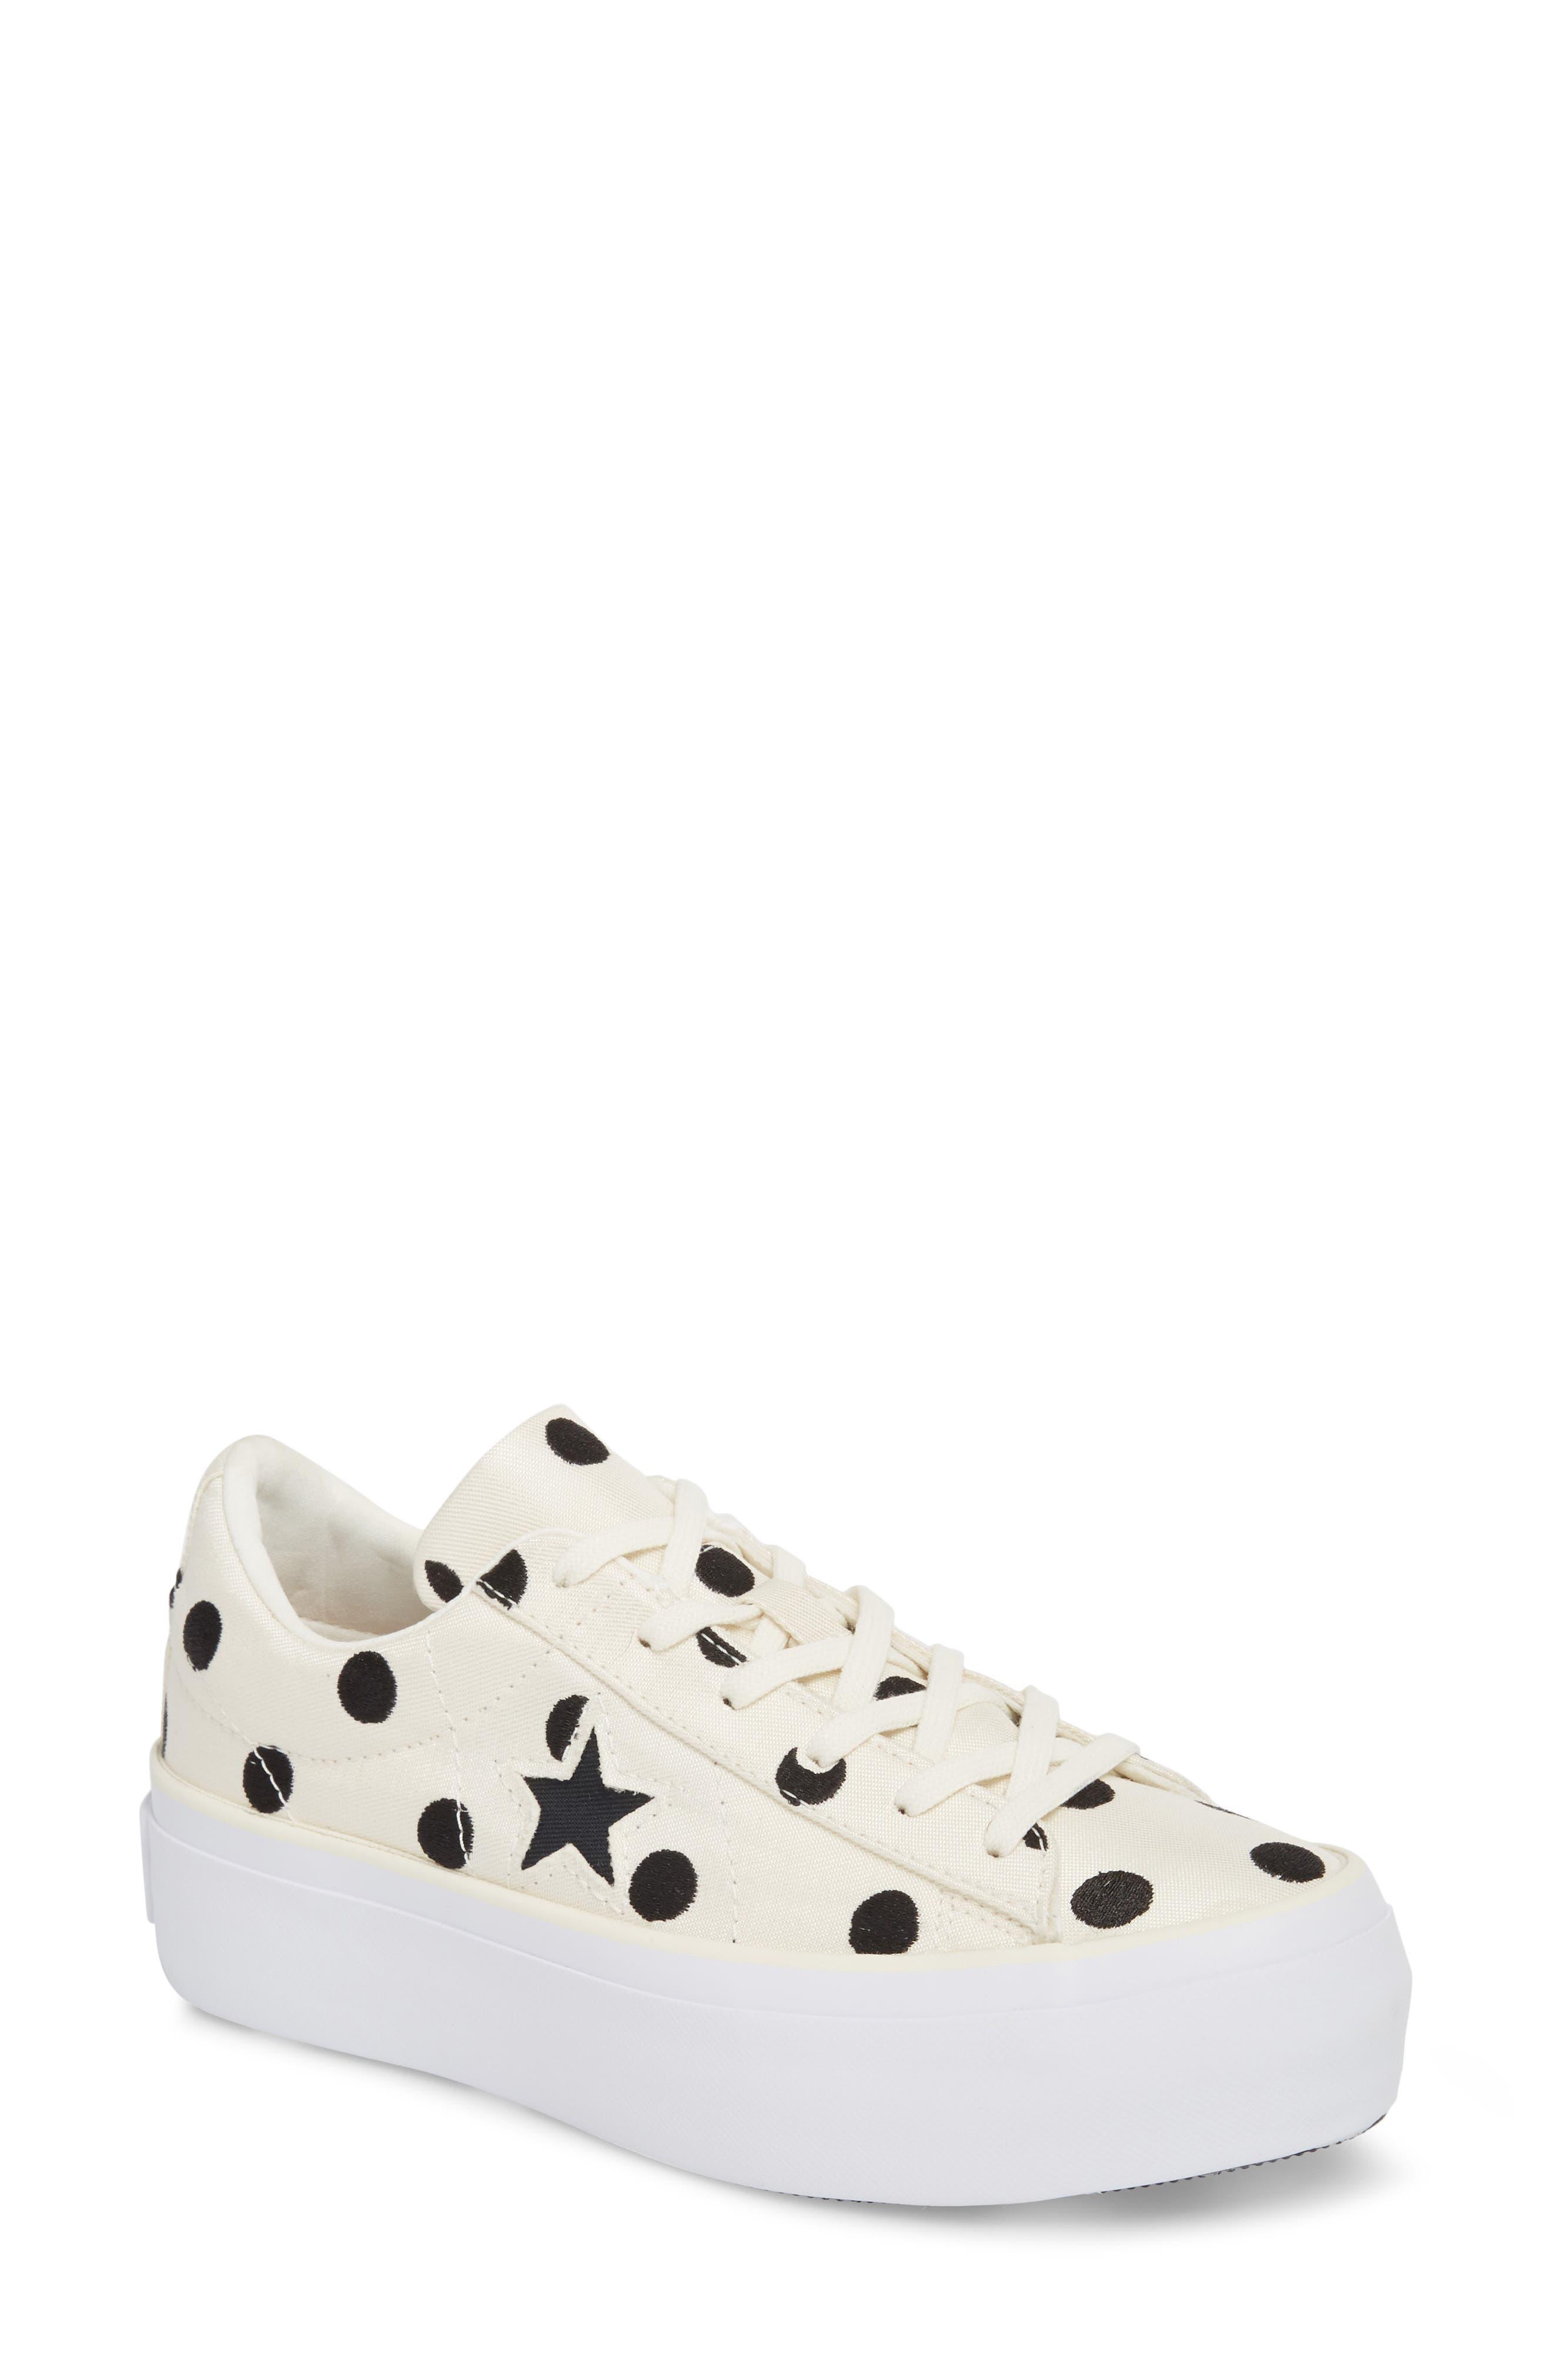 Chuck Taylor<sup>®</sup> One Star Platform Sneaker,                         Main,                         color, Egret/ Black